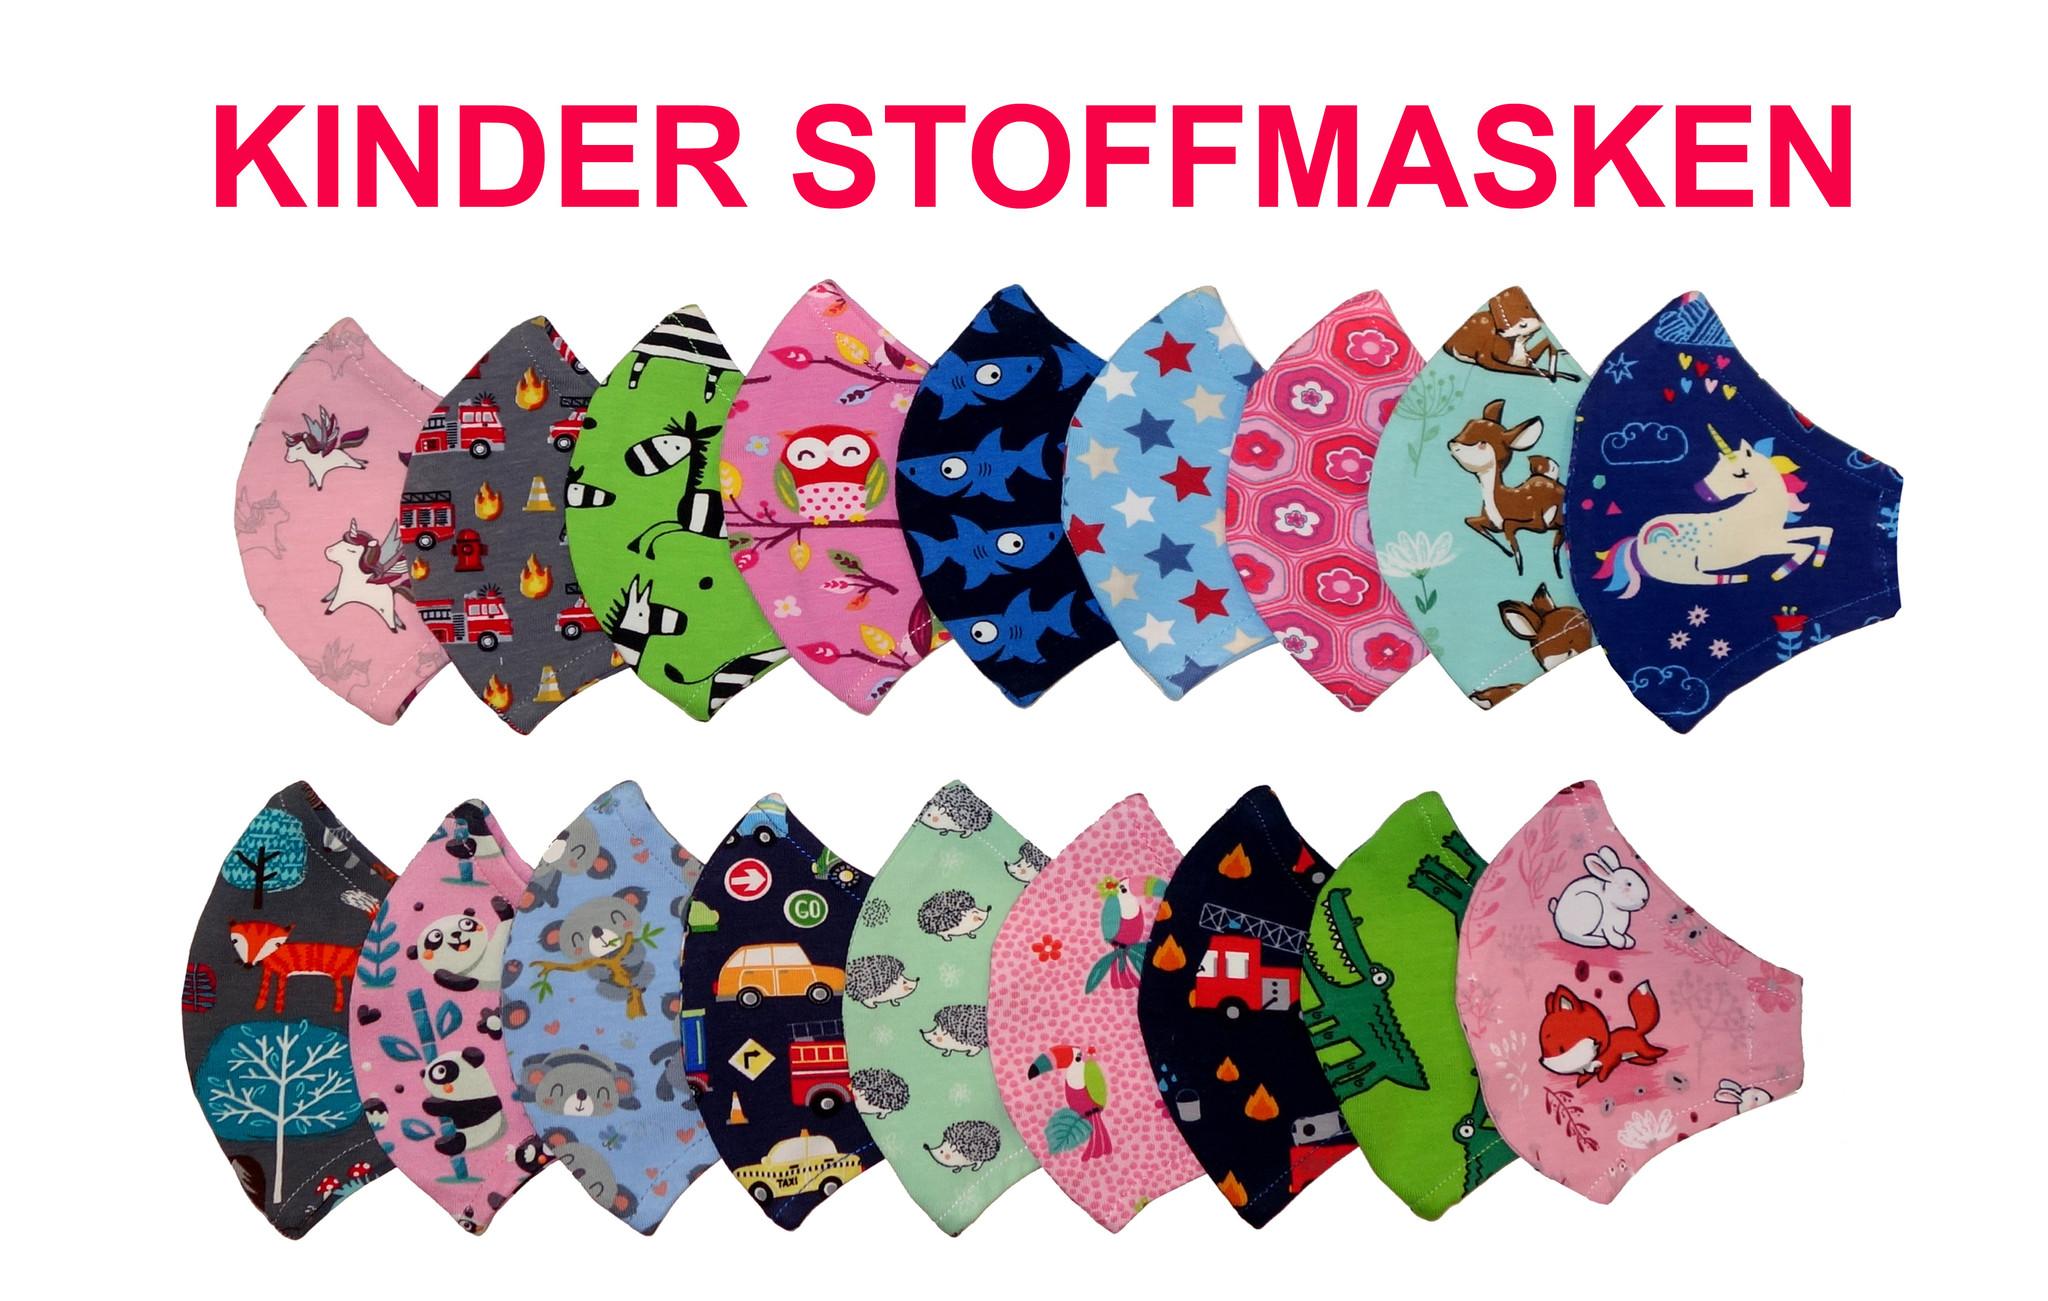 Kindermasken, Kinder Stoffmasken, Stoffmasken für Kinder, Kindermasken Wien, Kinder Stoffmasken Wien, Kindermasken kaufen, Stoffmasken kaufen, Kindermasken kaufen Wien, Stoffmasken kaufen Wien